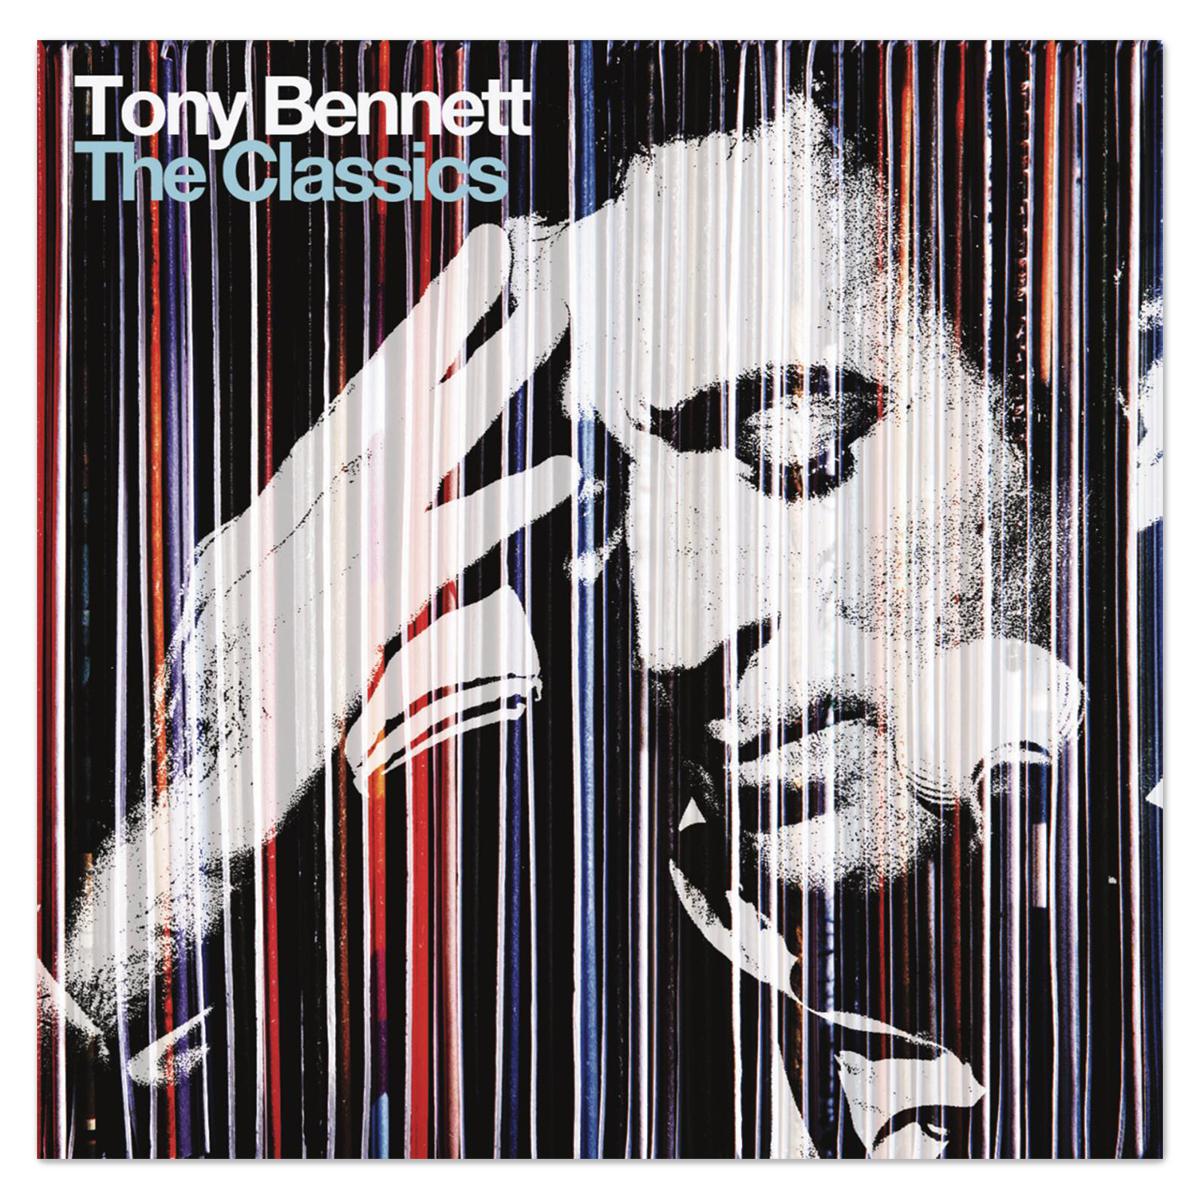 The Classics CD (Deluxe Version)